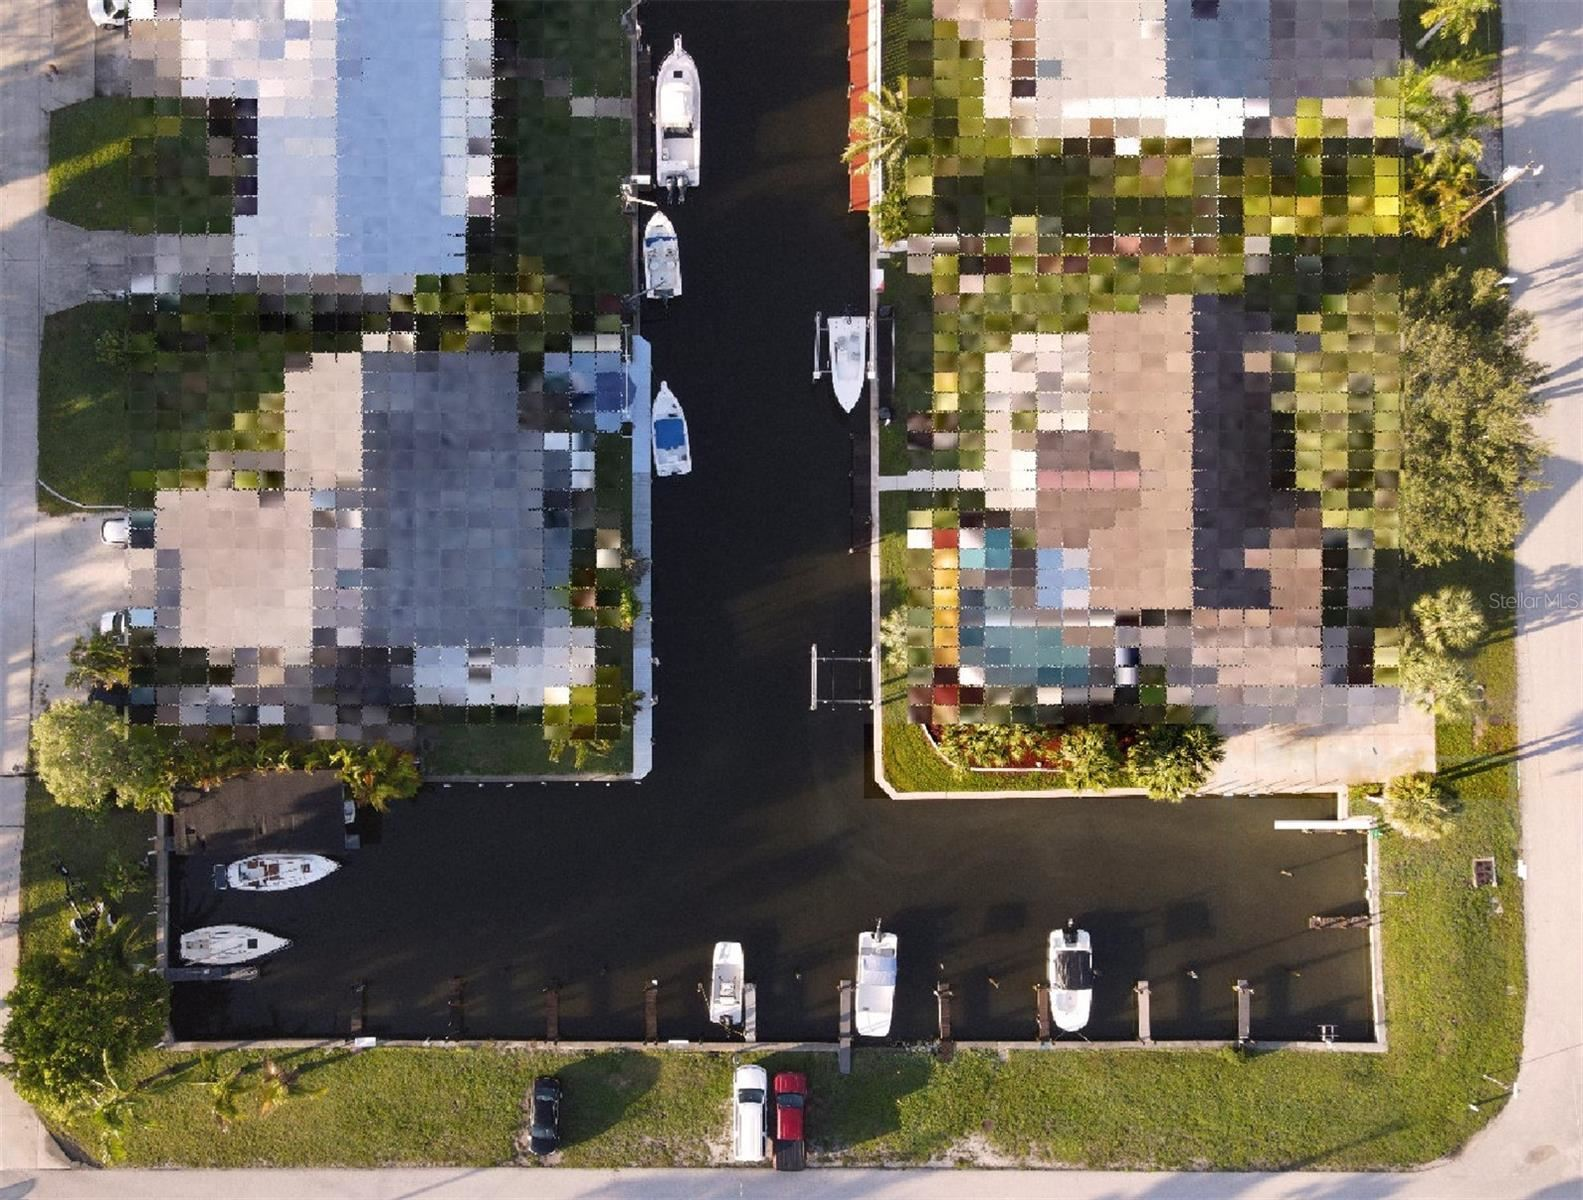 Photo of 9130 PINE COVE DRIVE #B32 / B31, ENGLEWOOD, FL 34224 (MLS # T3318994)